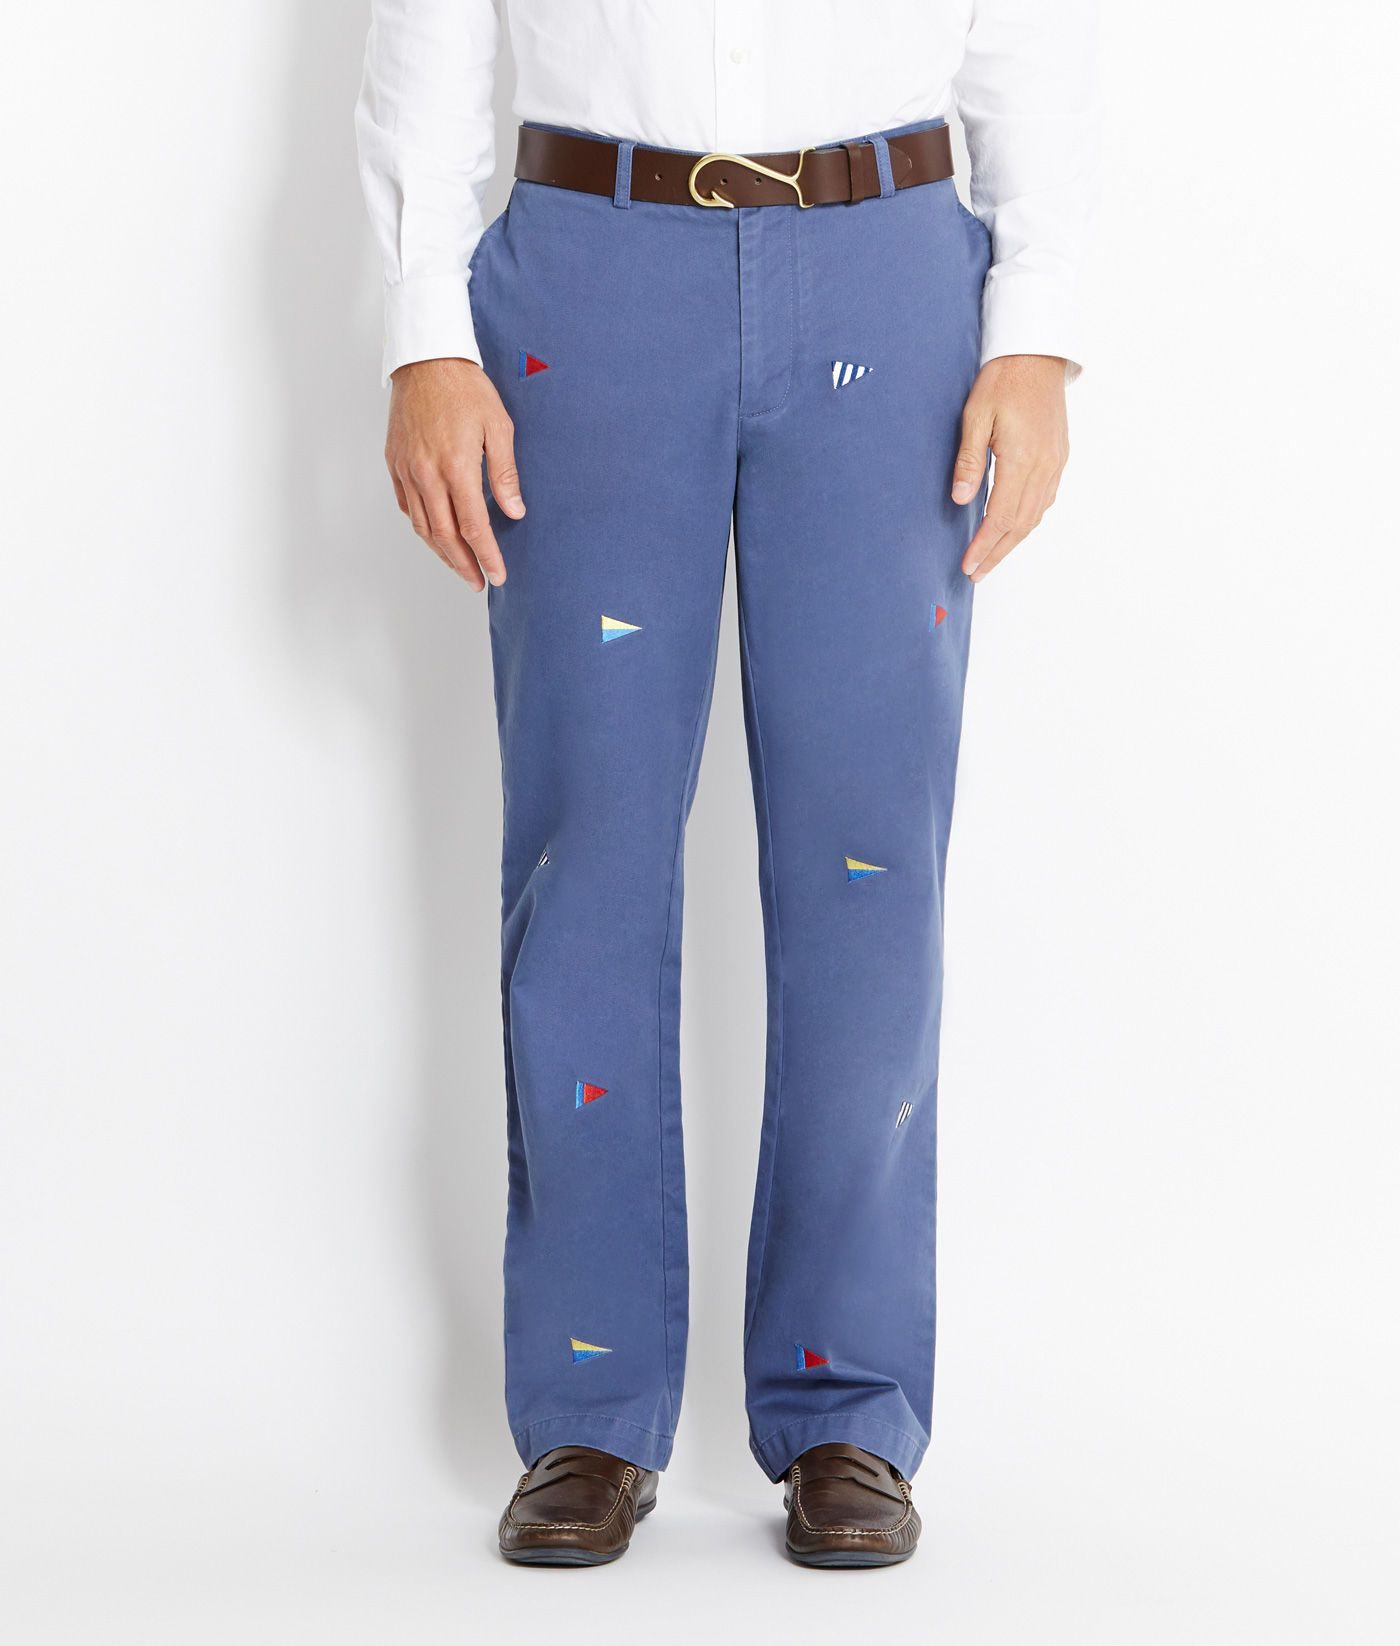 Shop Pants: Burgee Flag Embroidered Classic Fit Club Pants for Men   Vineyard Vines